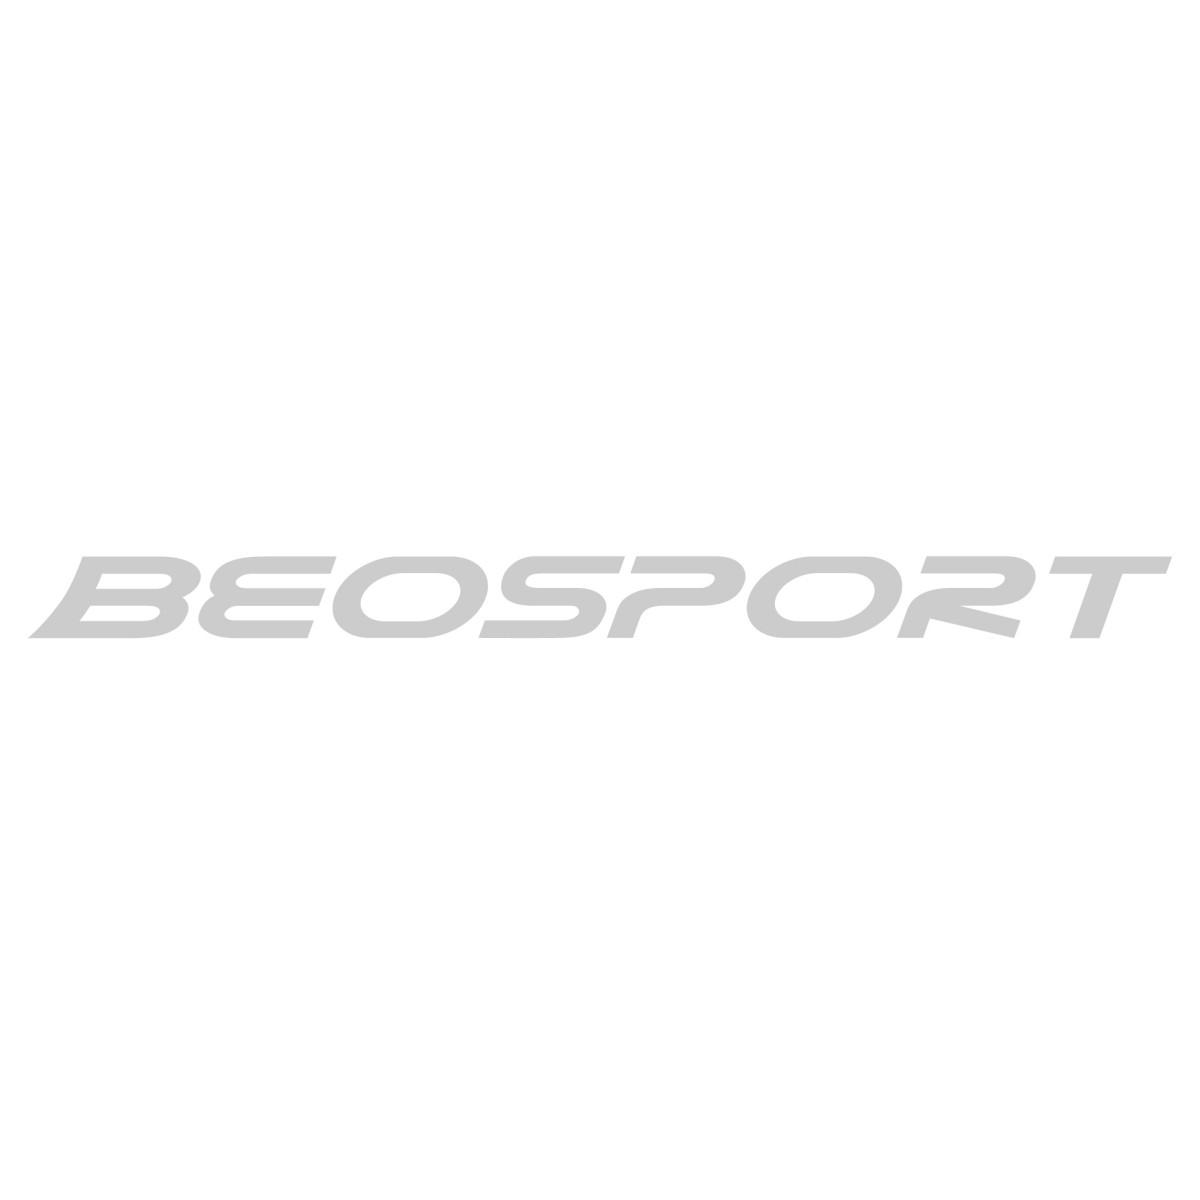 Skechers Bregman-Calsen čizme